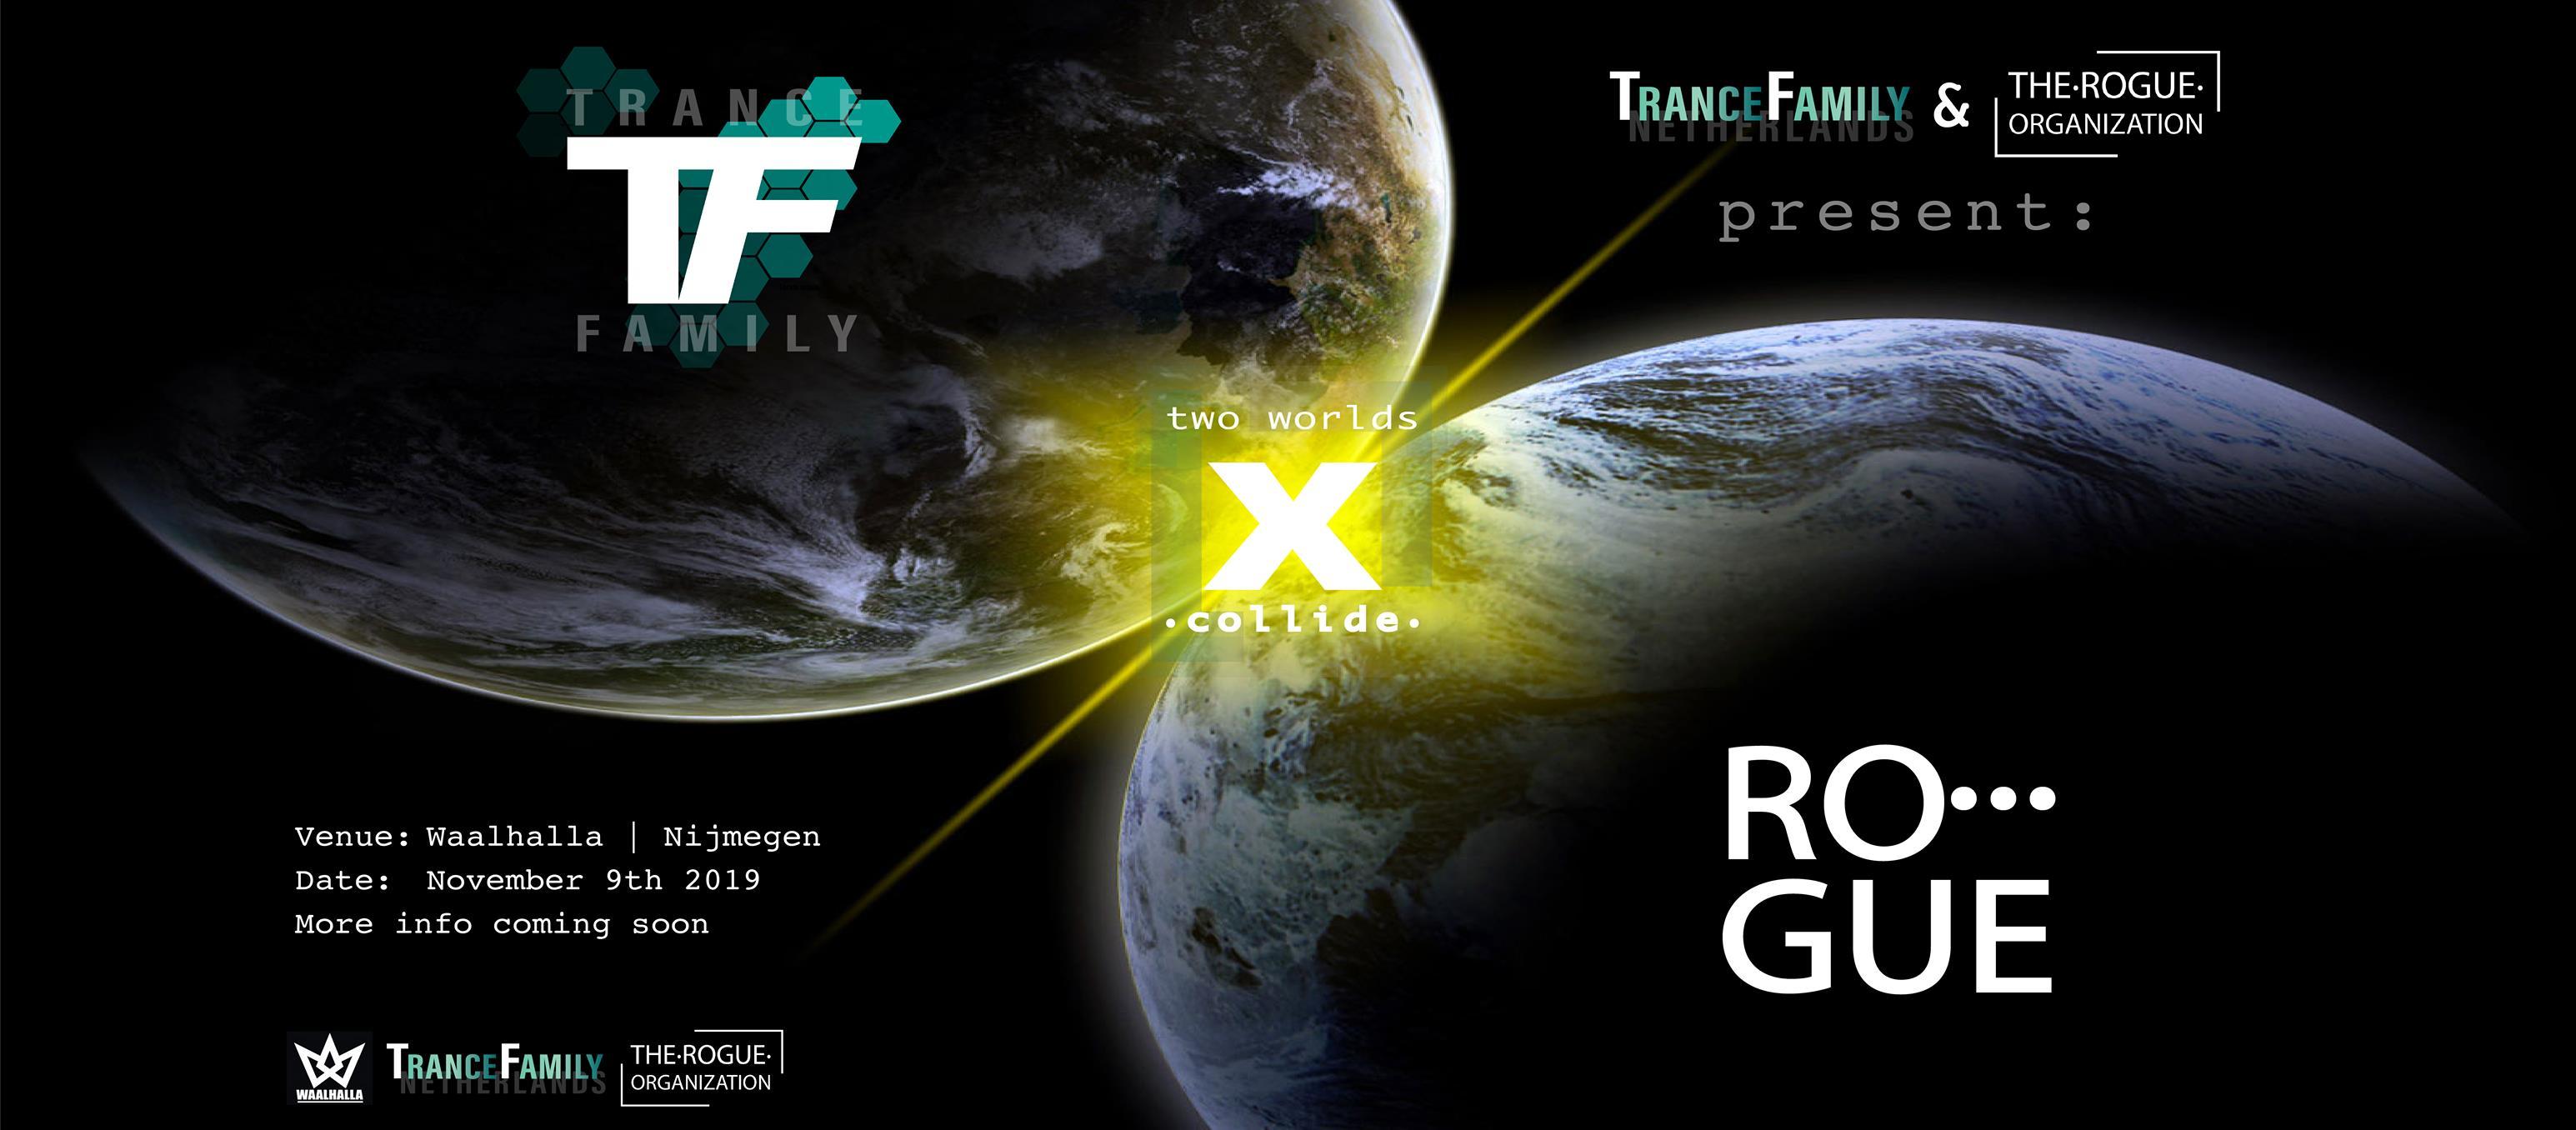 09.11.2019 TranceFamily X Rogue, Nijmegen